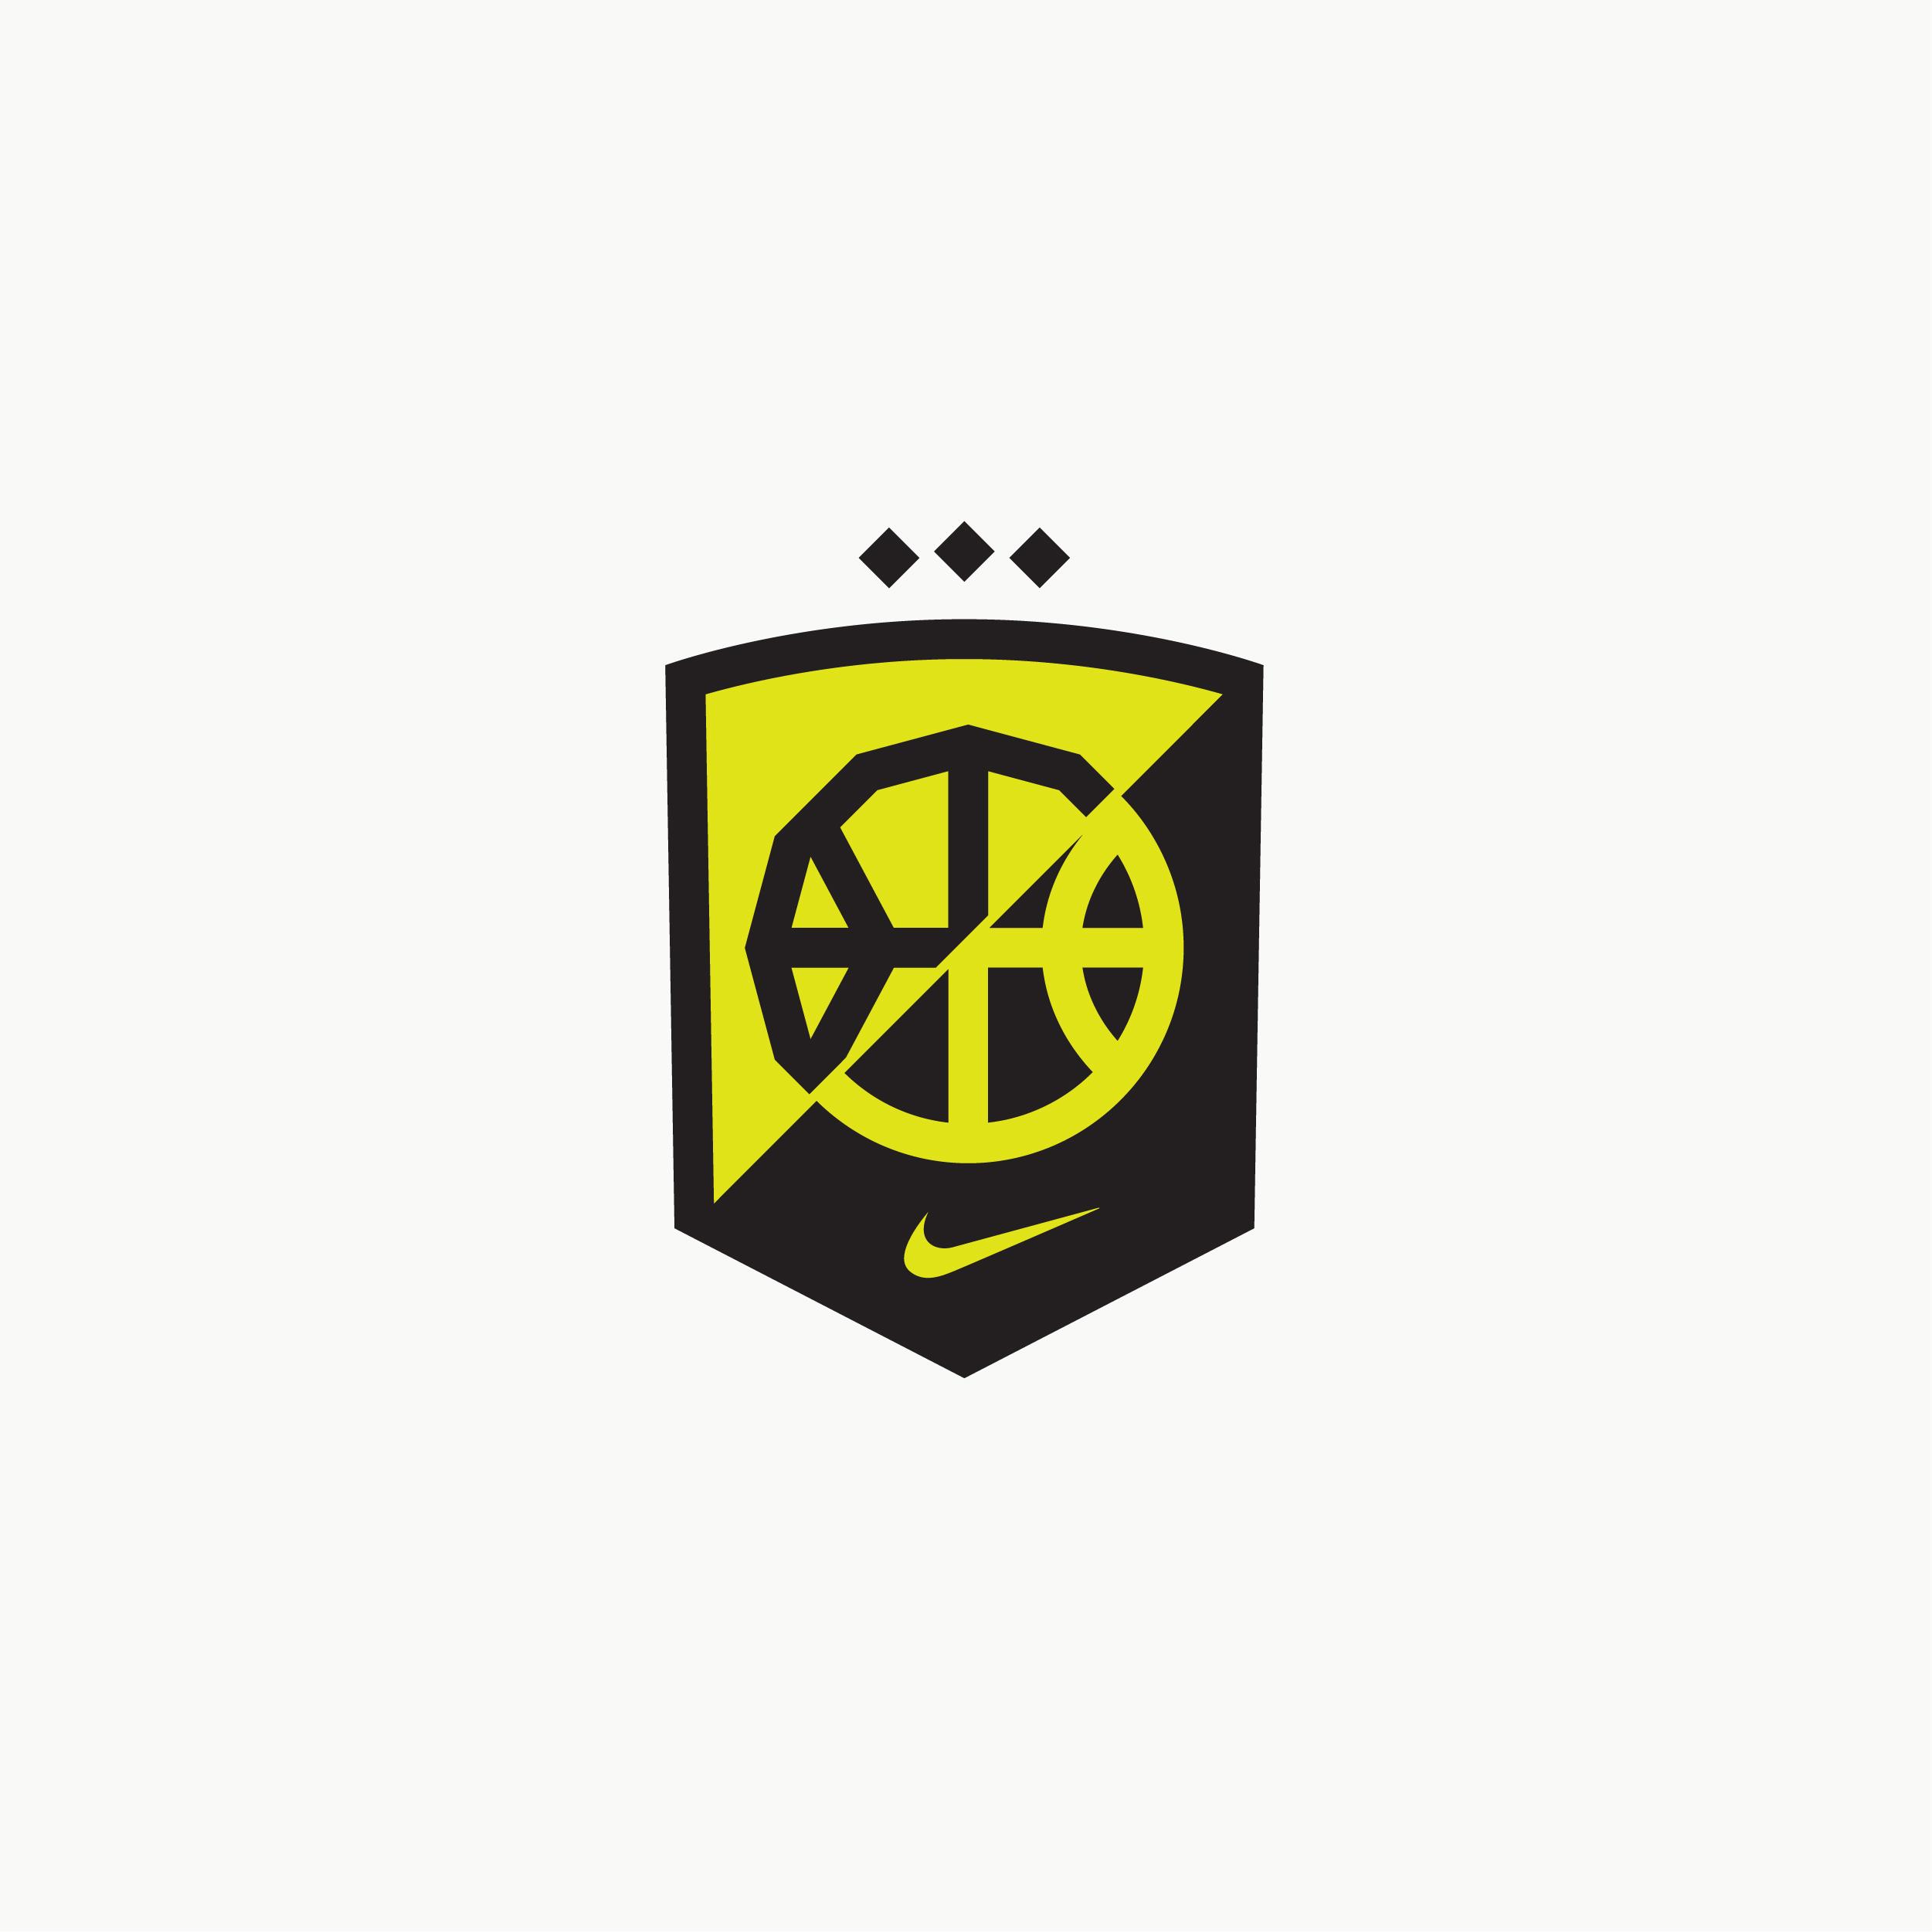 TBS_LogosMarks_NikeAcademy_1